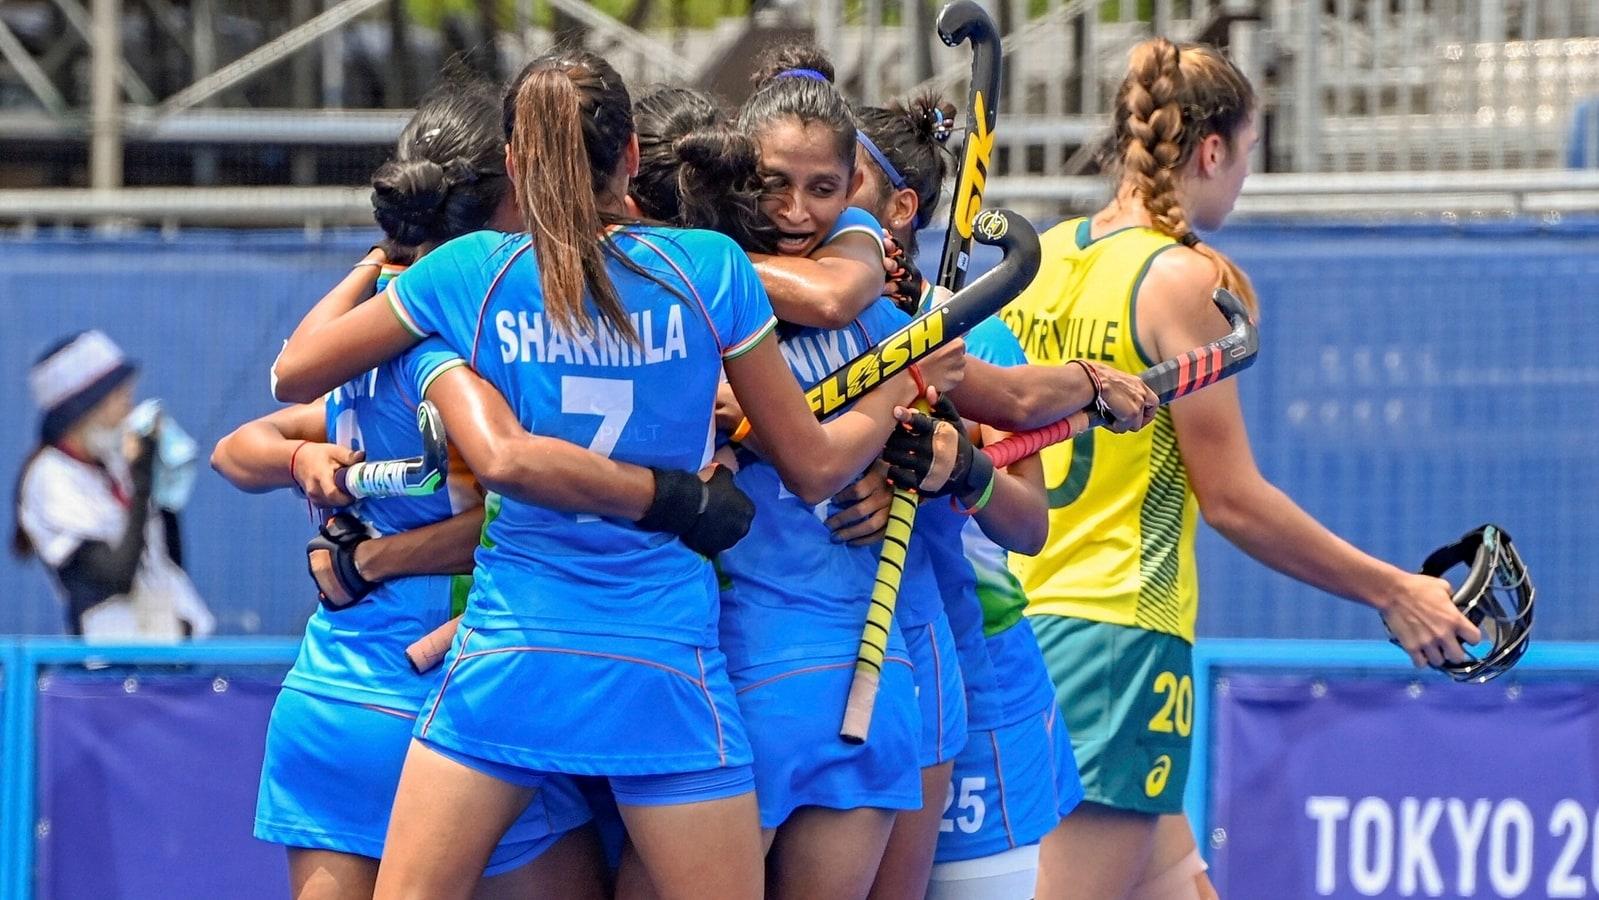 Tokyo Olympics: India create history, beat Australia 1-0 to reach  semifinals in women's hockey   Olympics - Hindustan Times